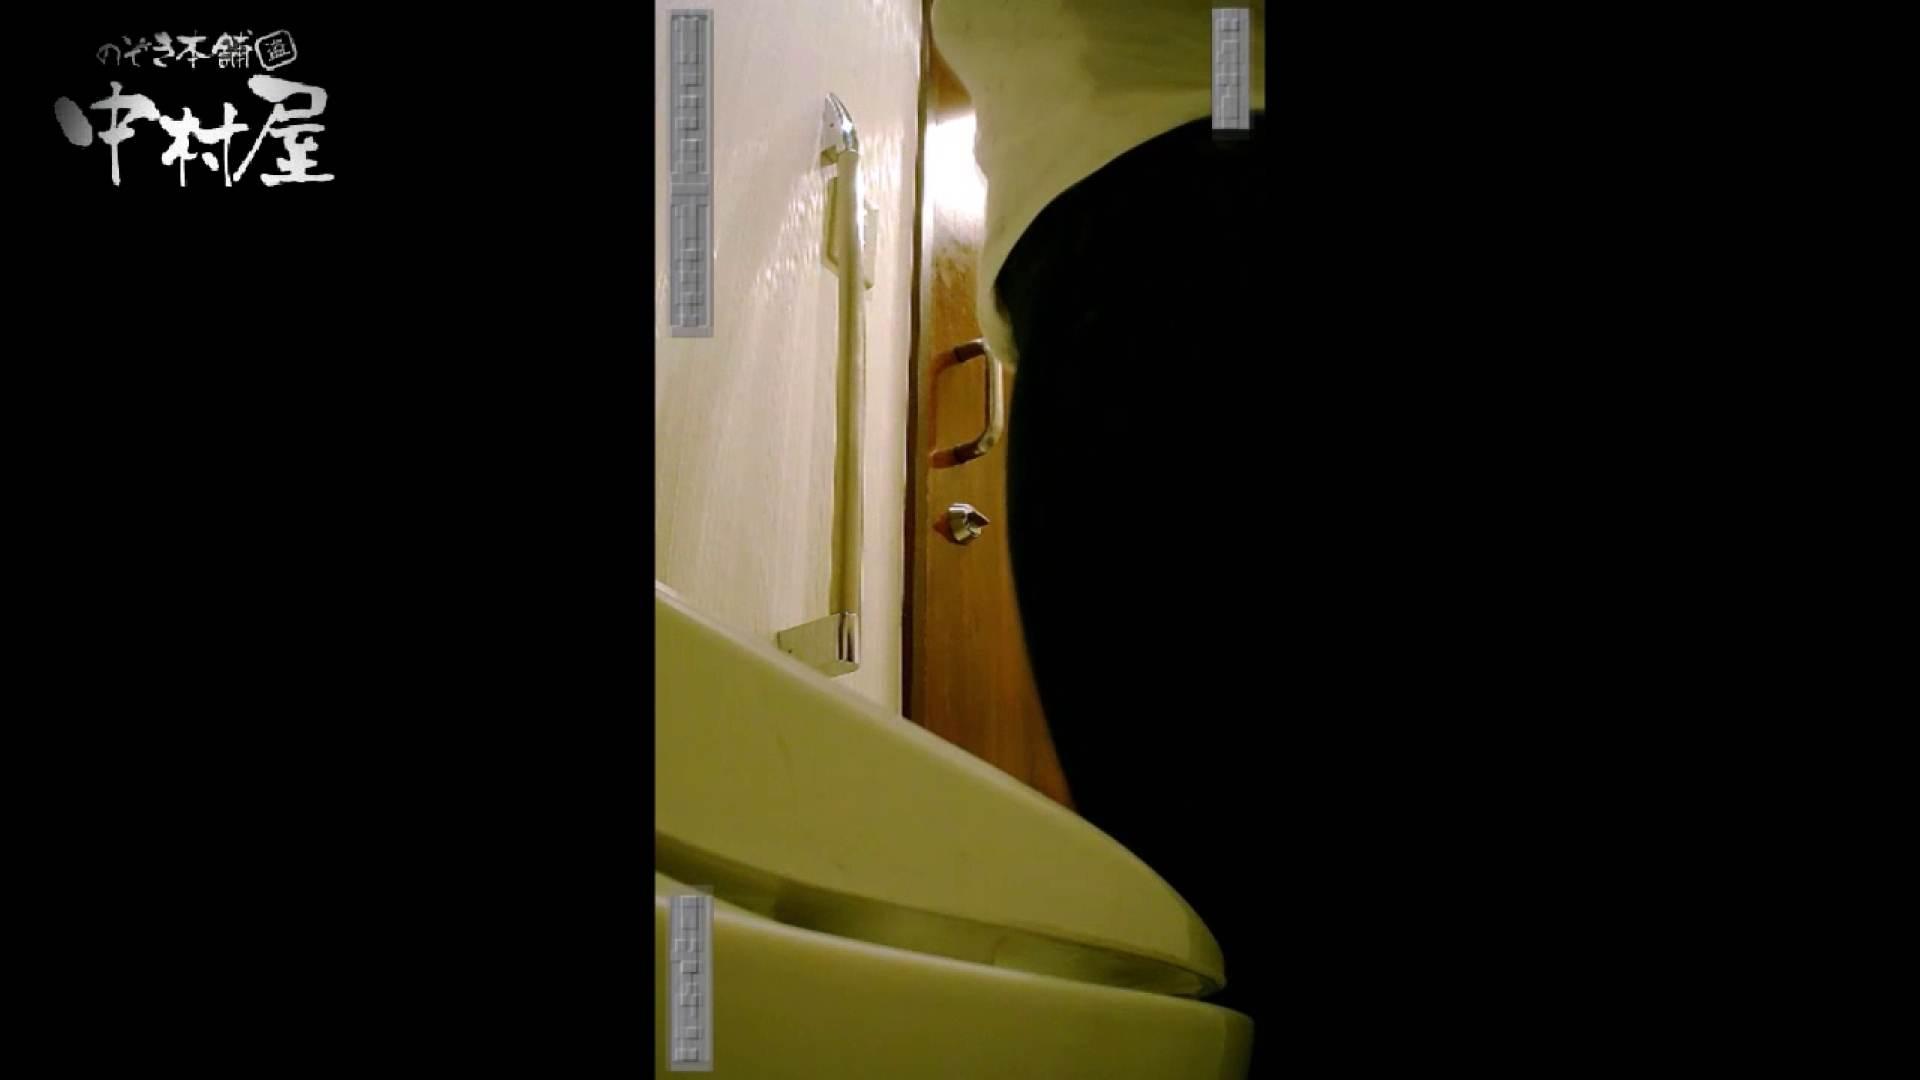 高画質トイレ盗撮vol.15 盗撮 SEX無修正画像 111画像 27